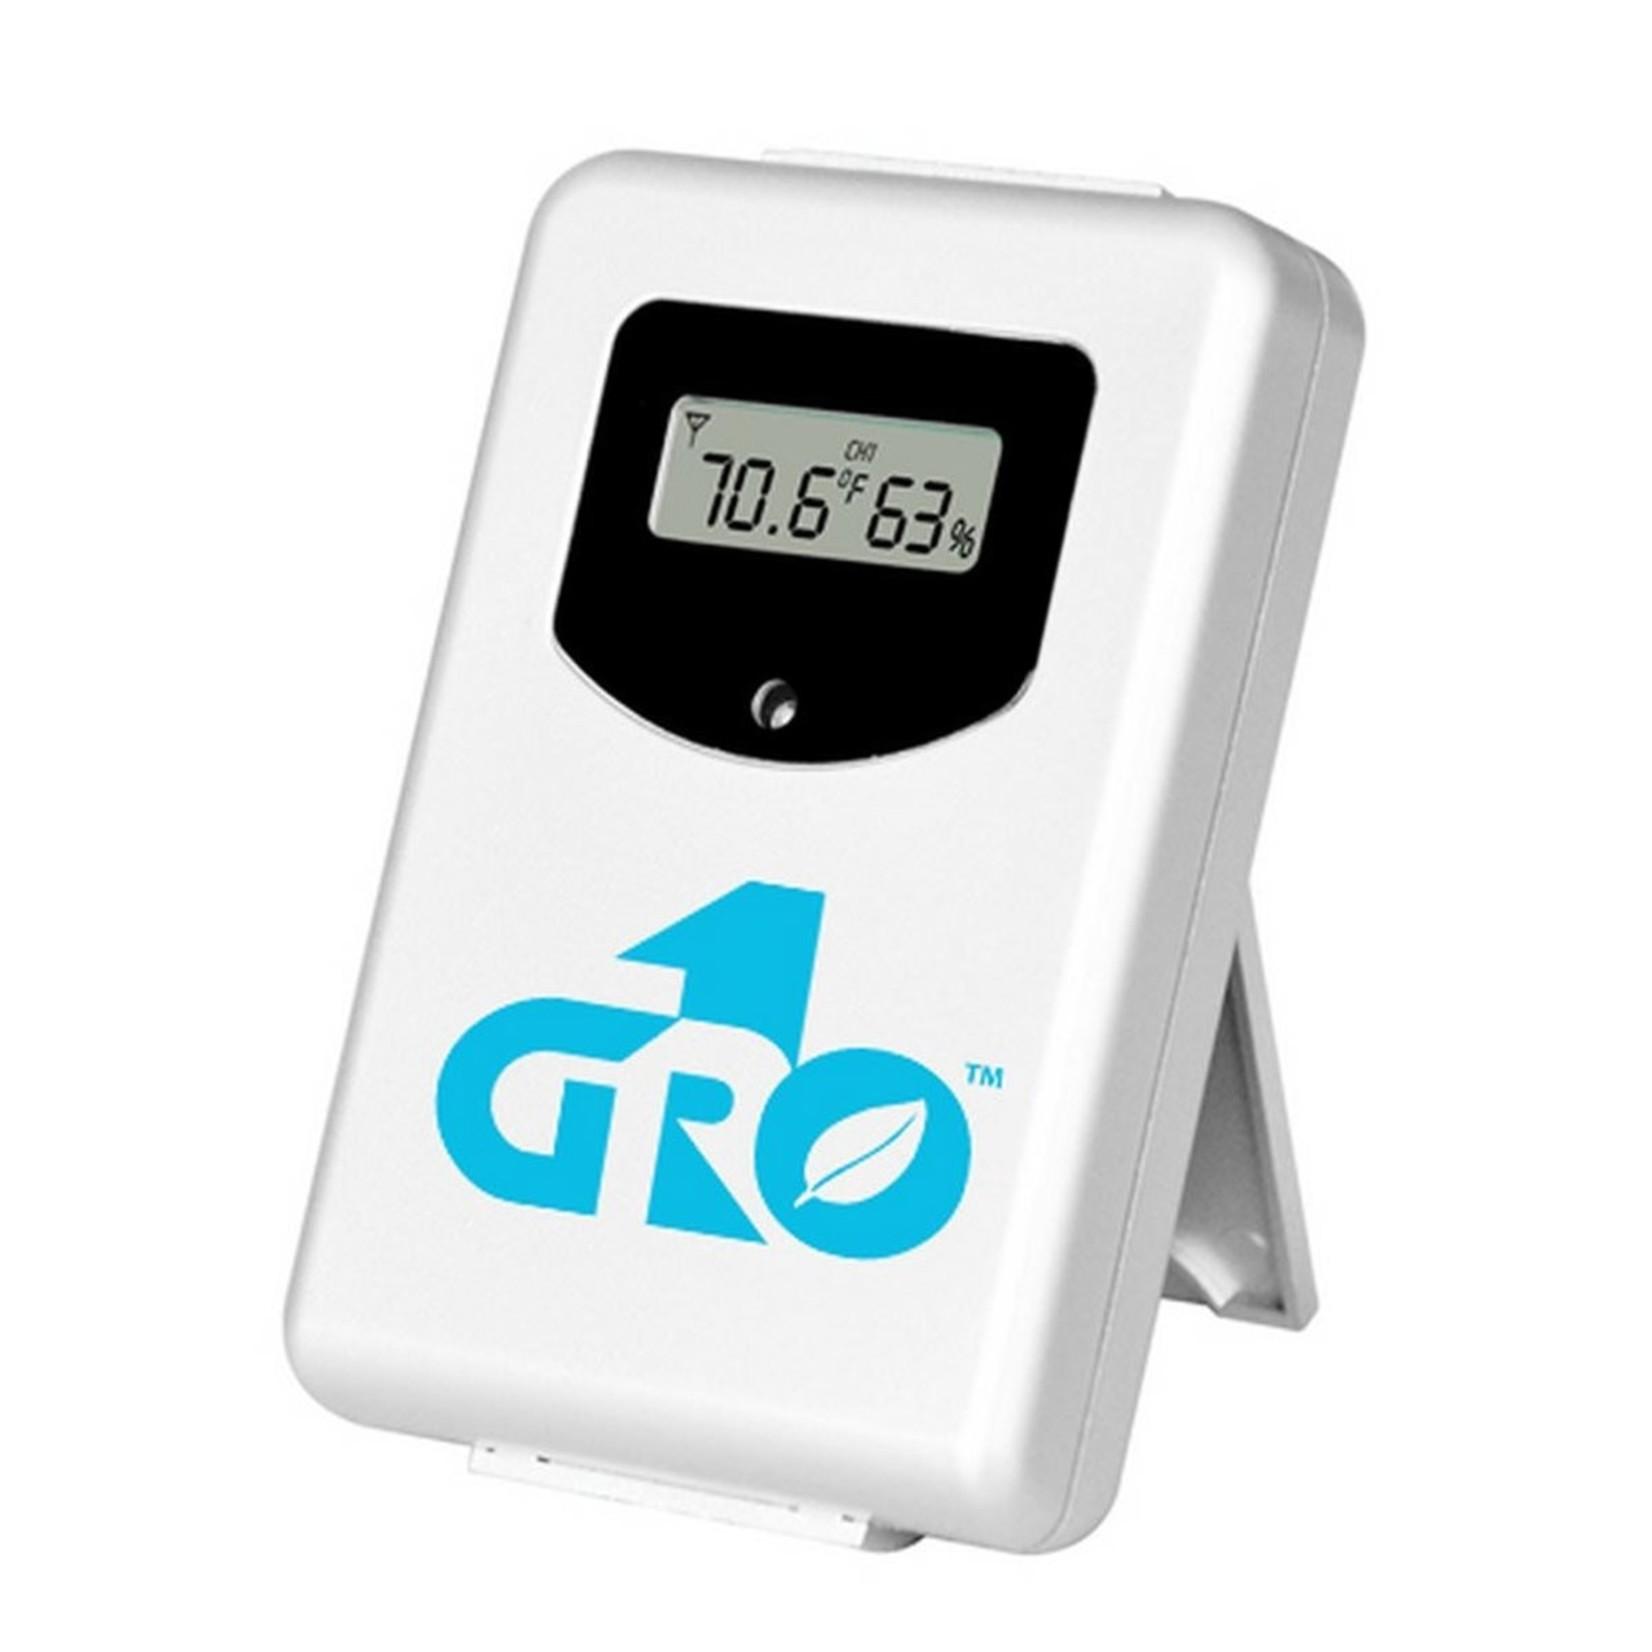 Gro1 Gro1 Wireless Sensor for Weather Station